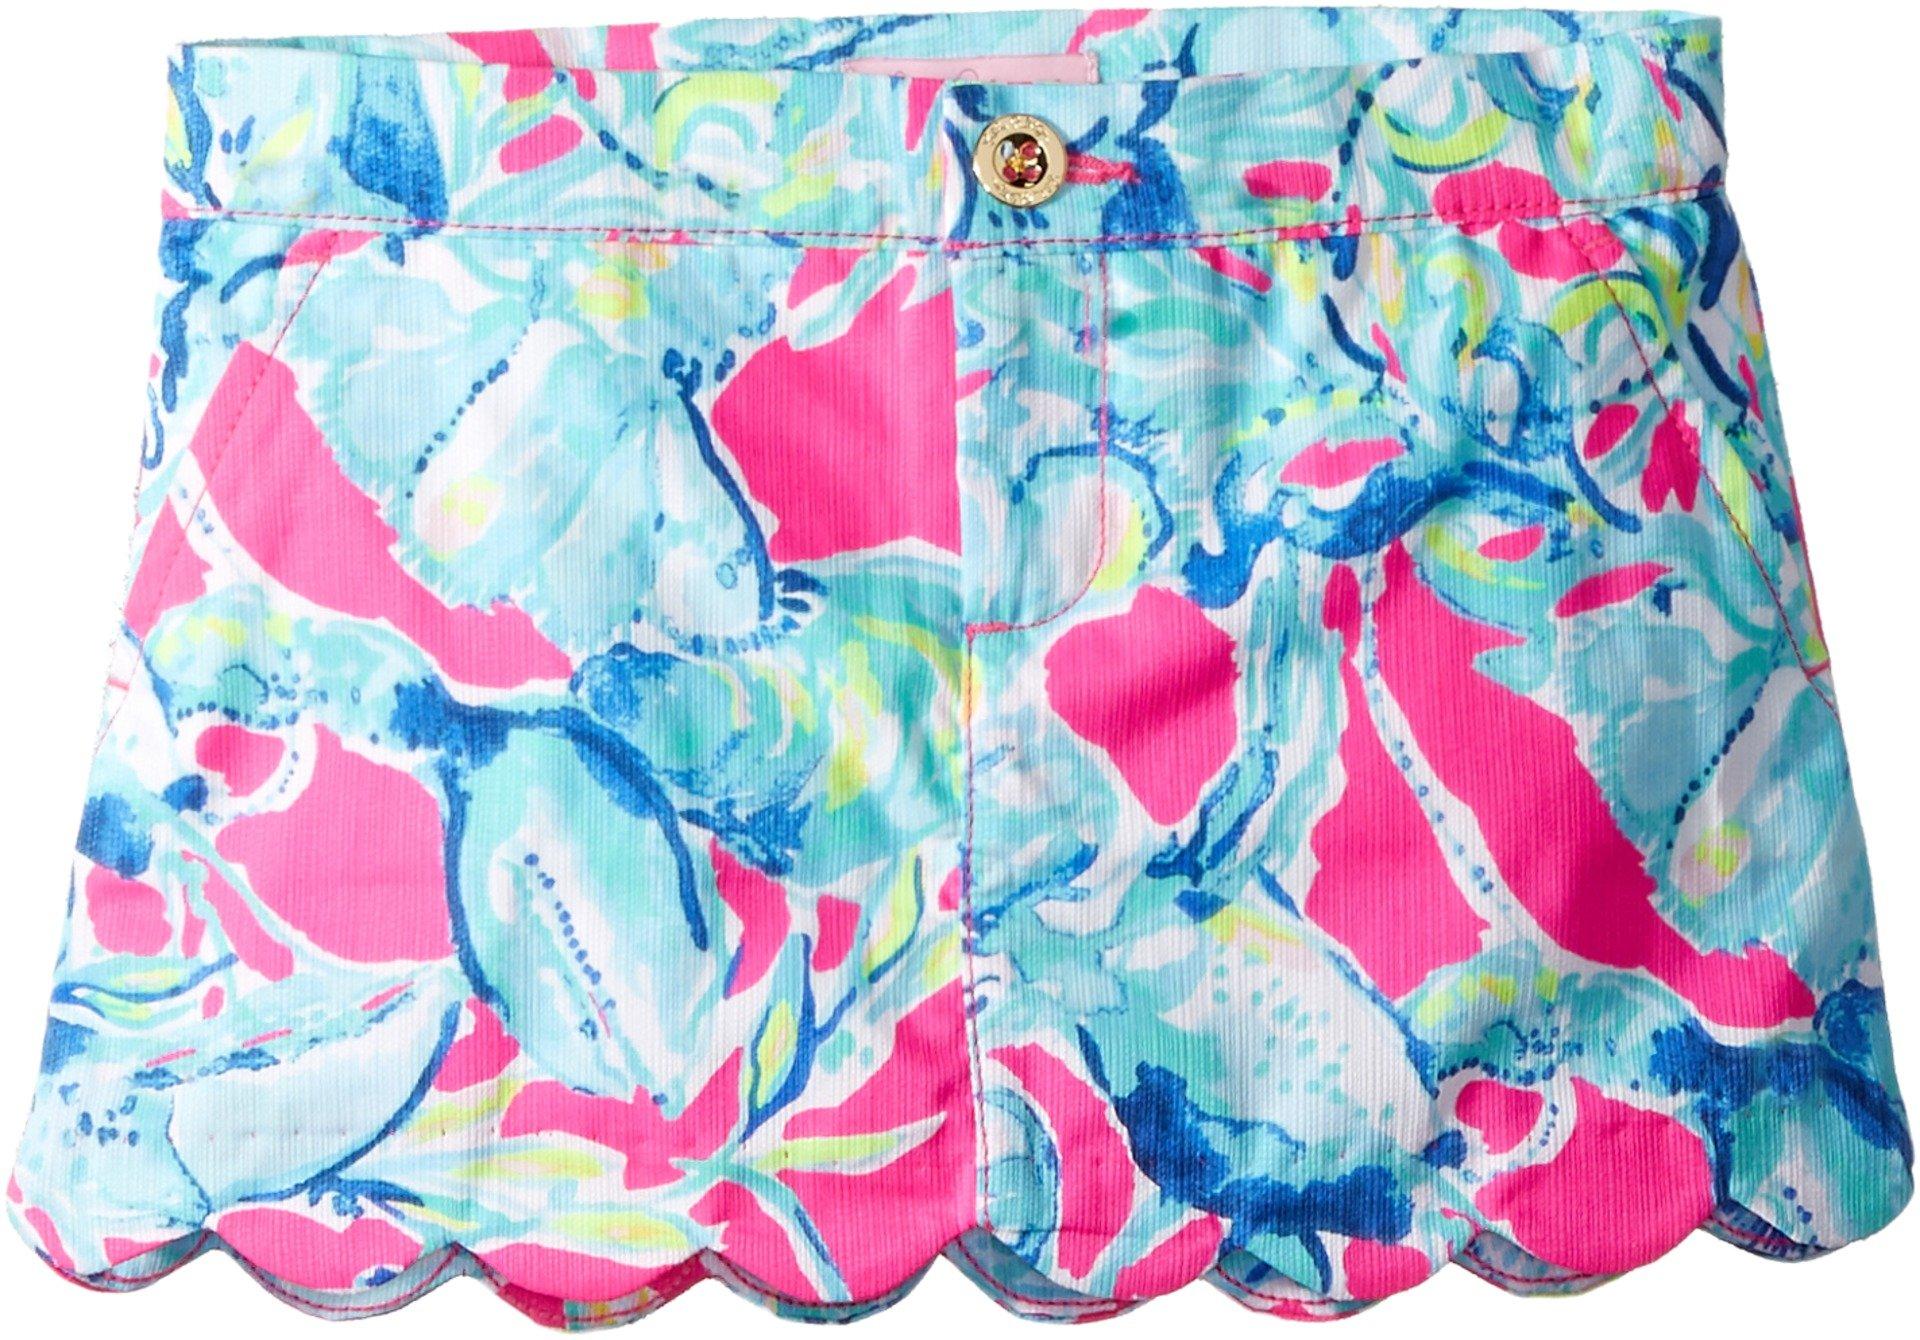 Lilly Pulitzer Kids Baby Girl's Mini Colette Skort (Toddler/Little Kids/Big Kids) Raz Berry Lobsters in Love 6